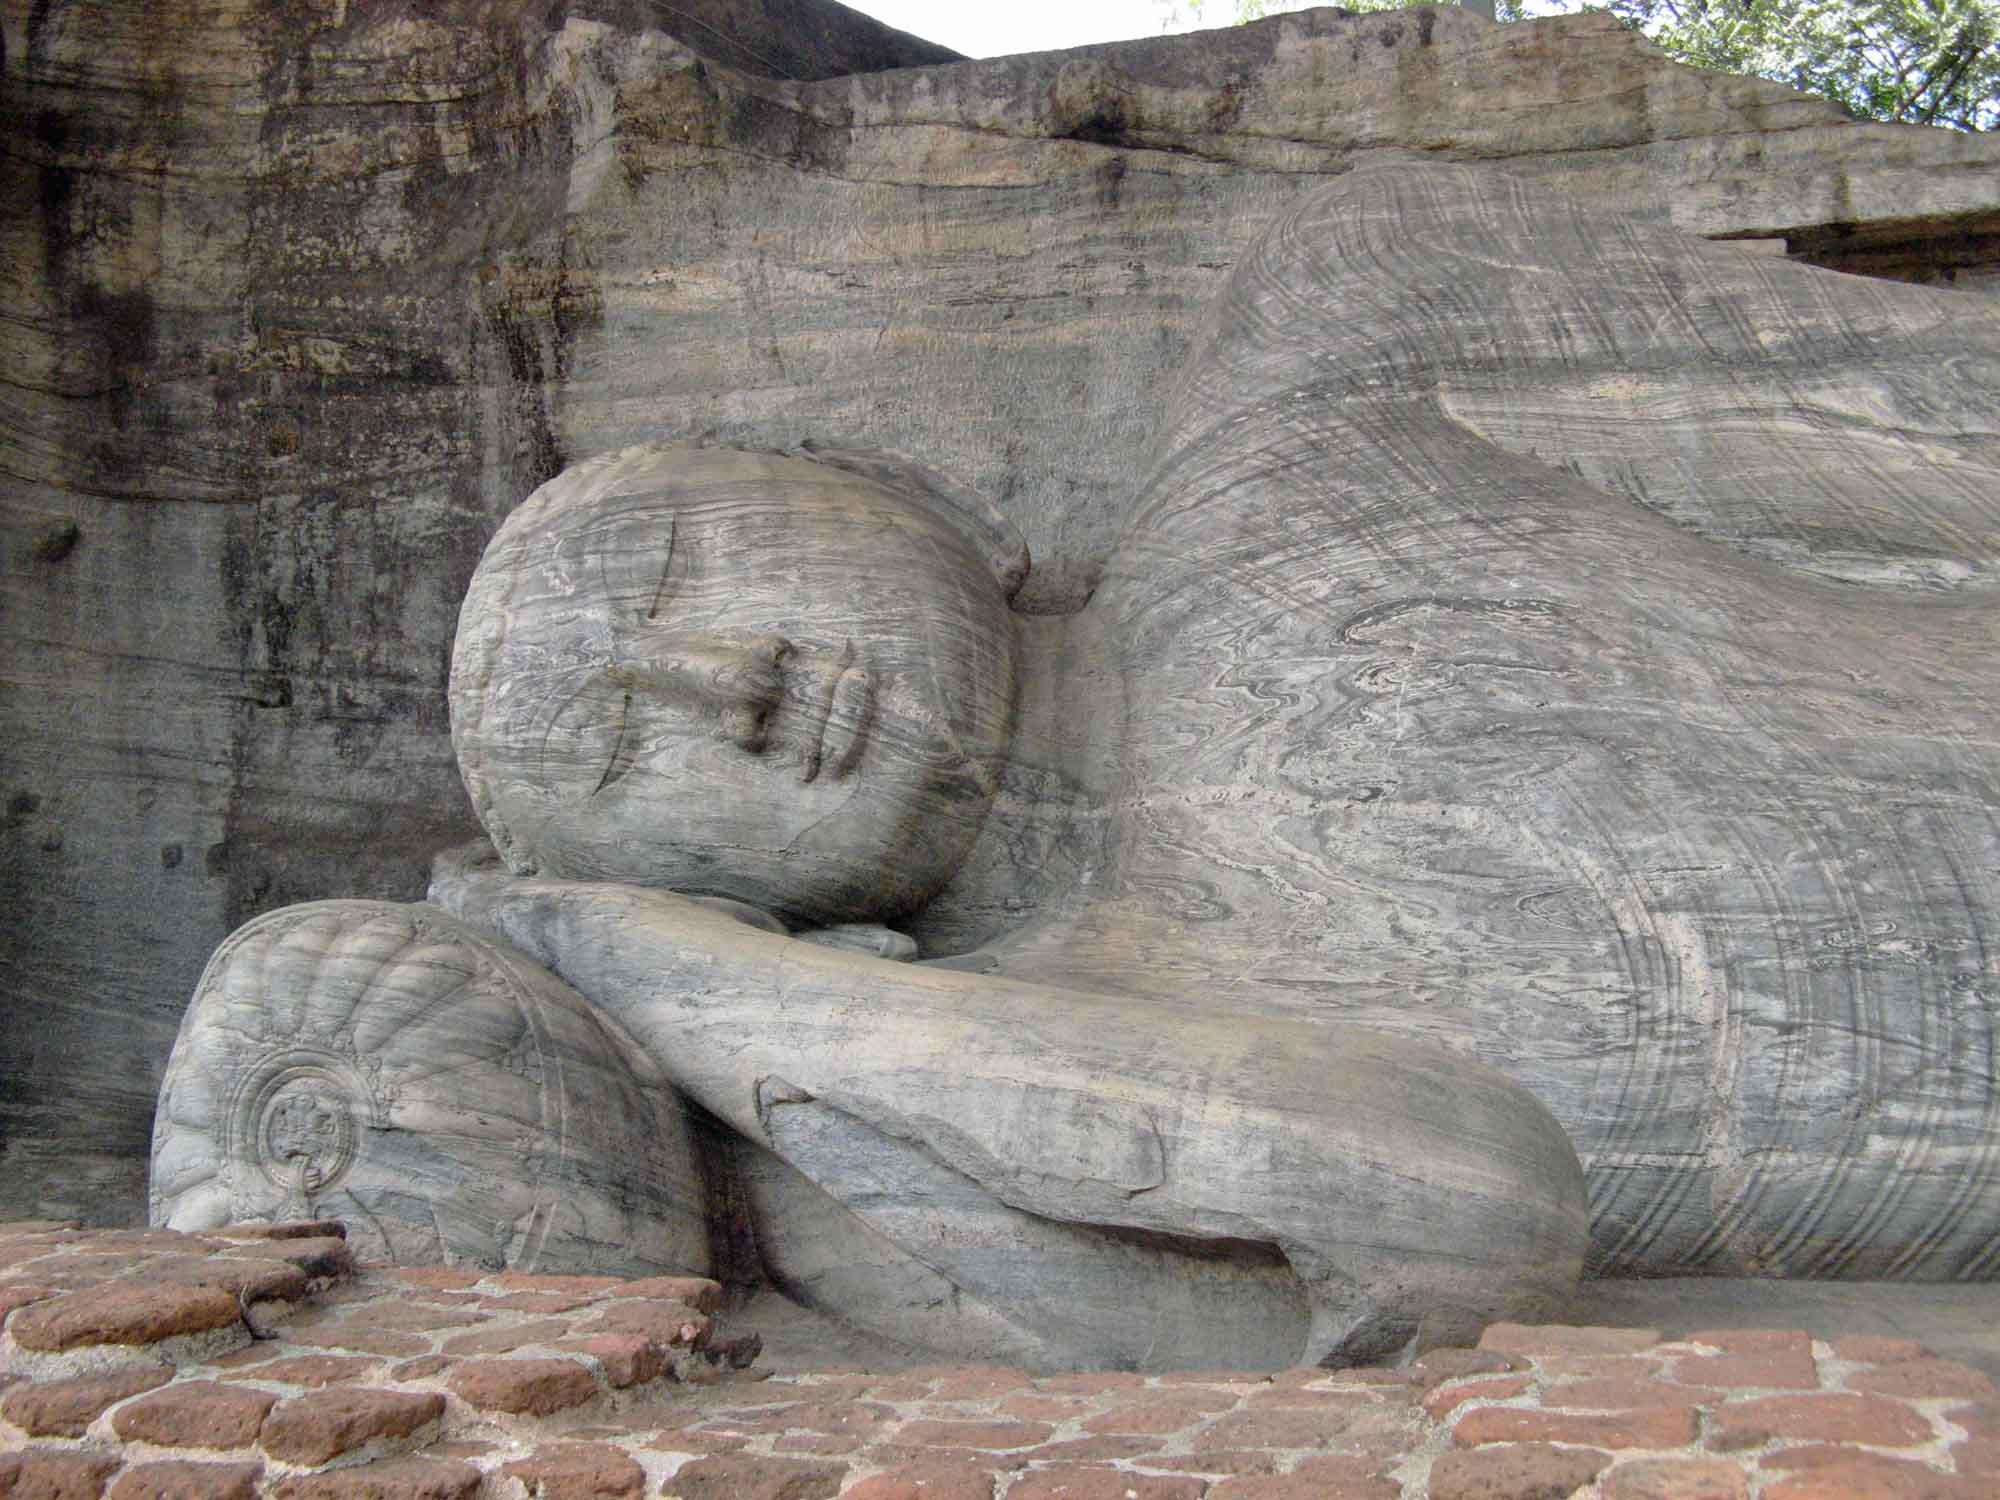 cosa visitare in Sri Lanka - Budda